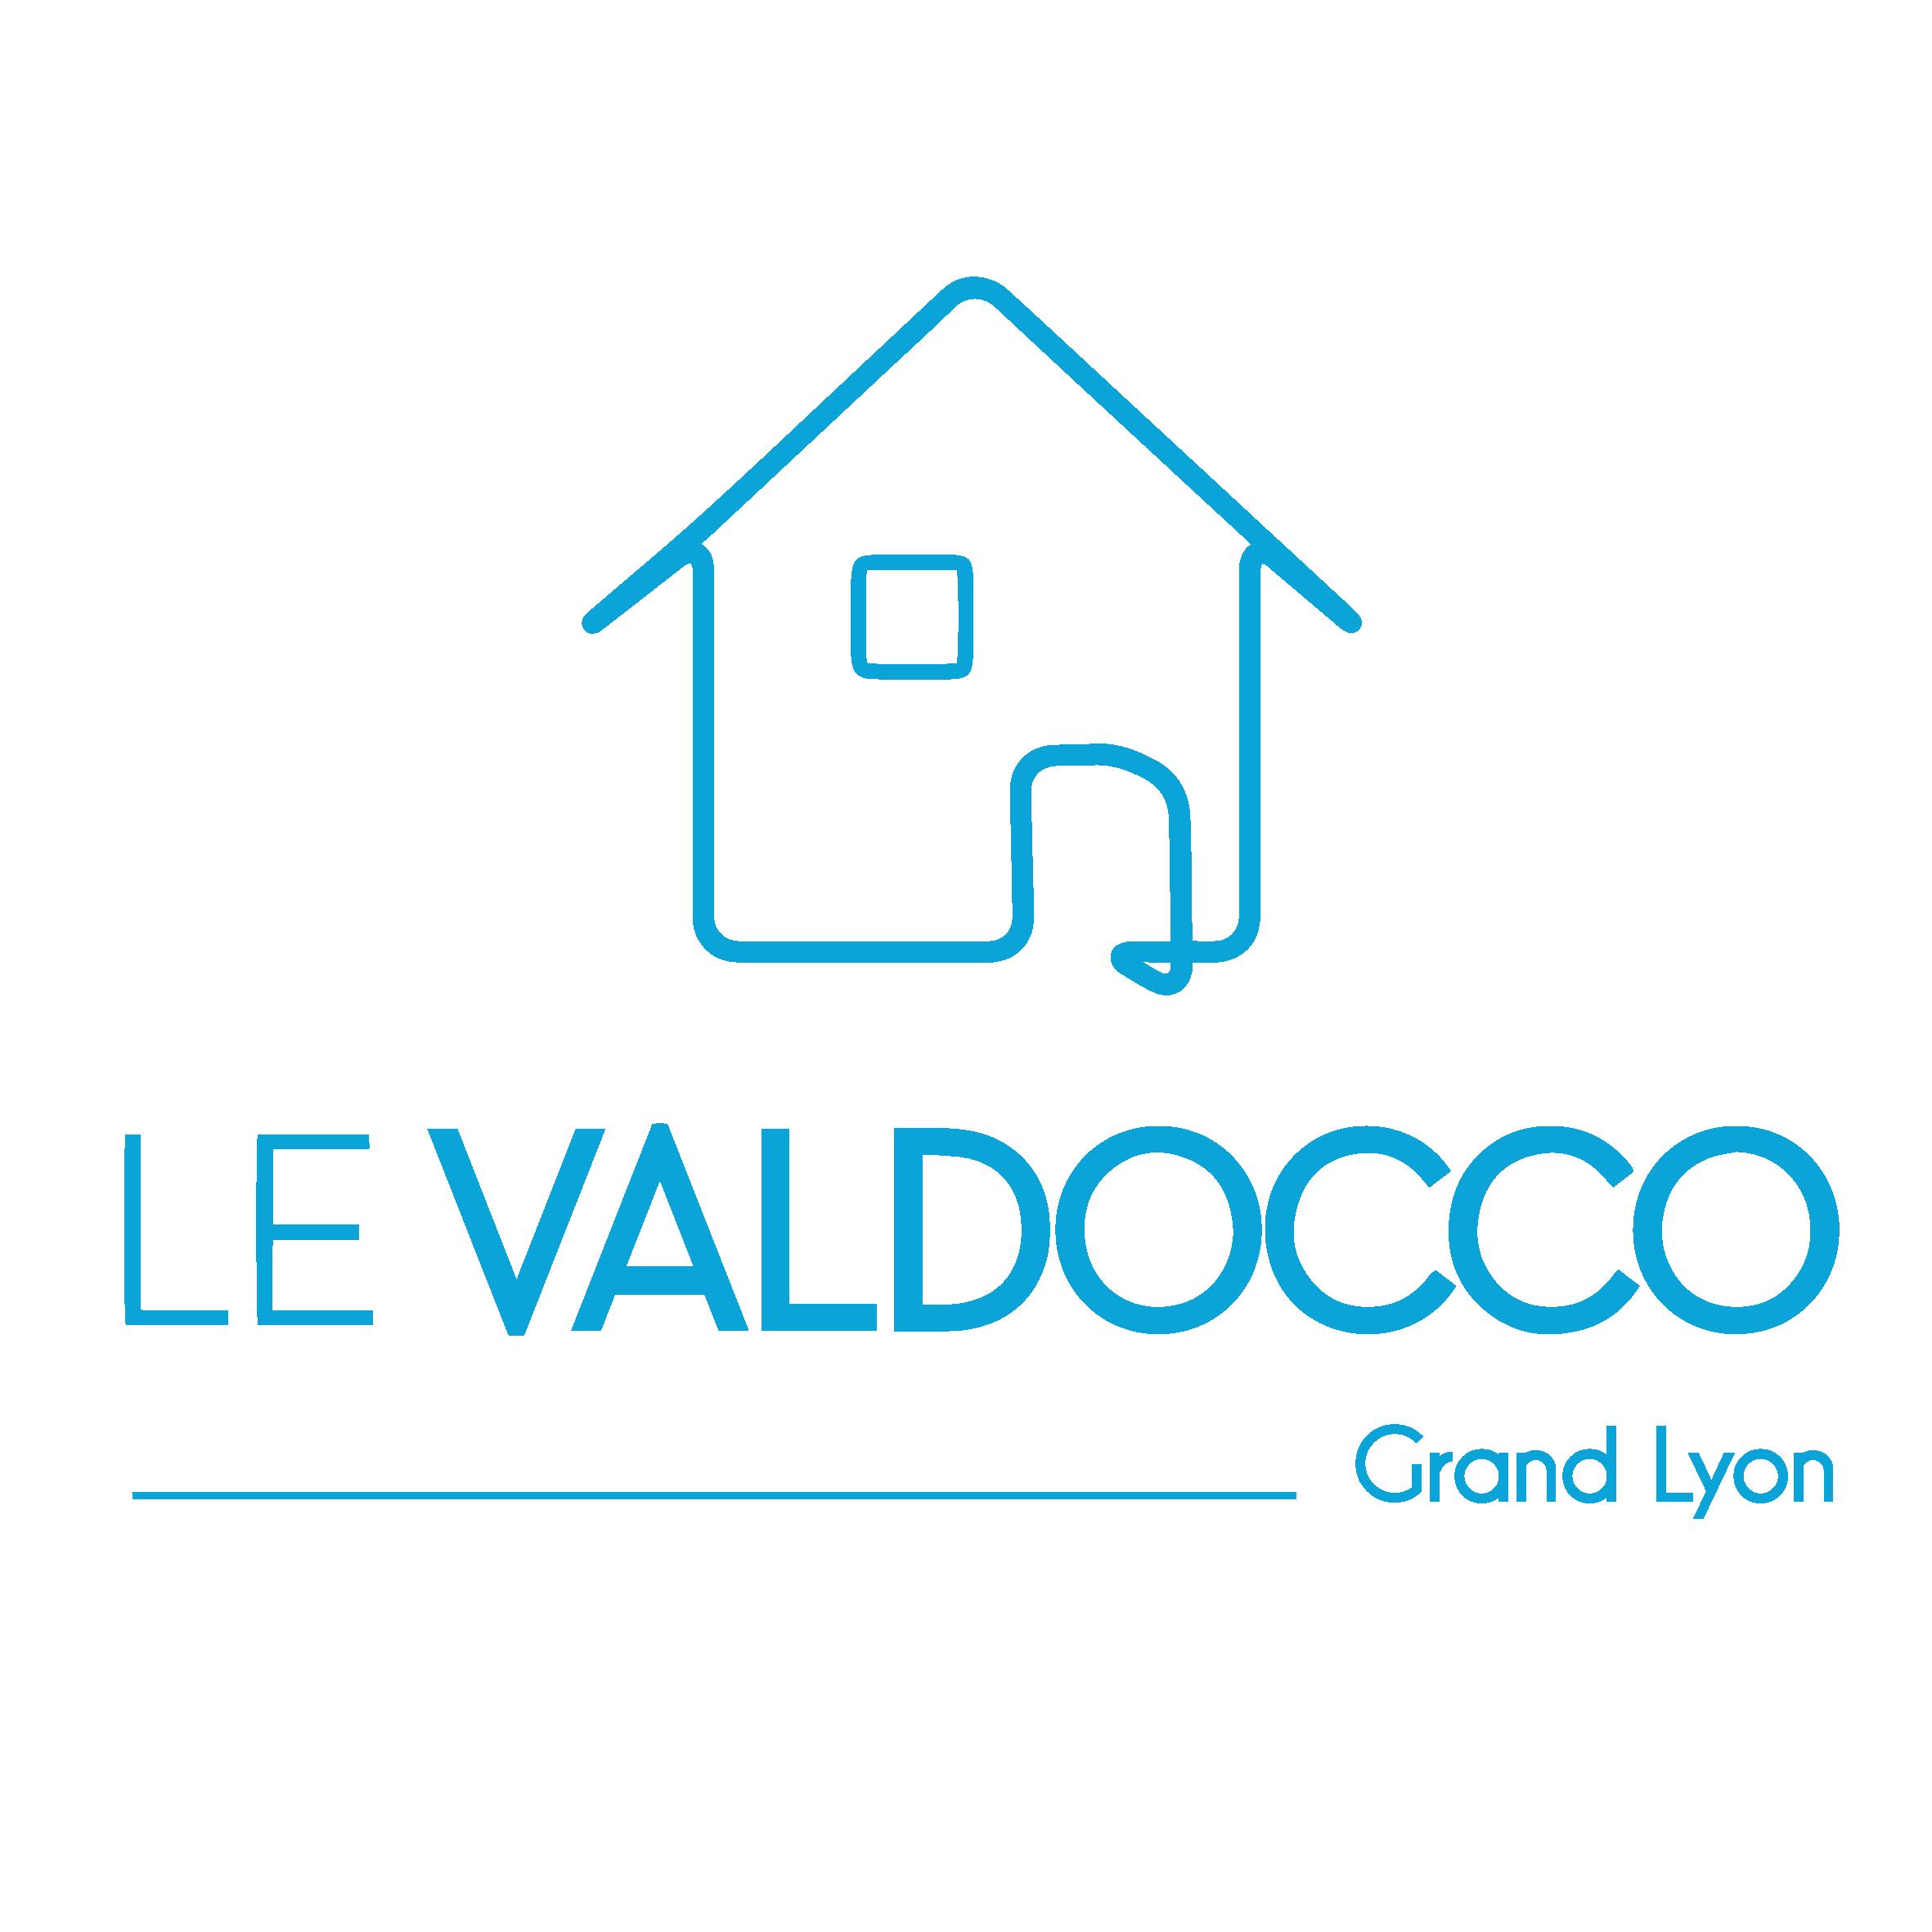 Le Valdocco_Logo Grand Lyon